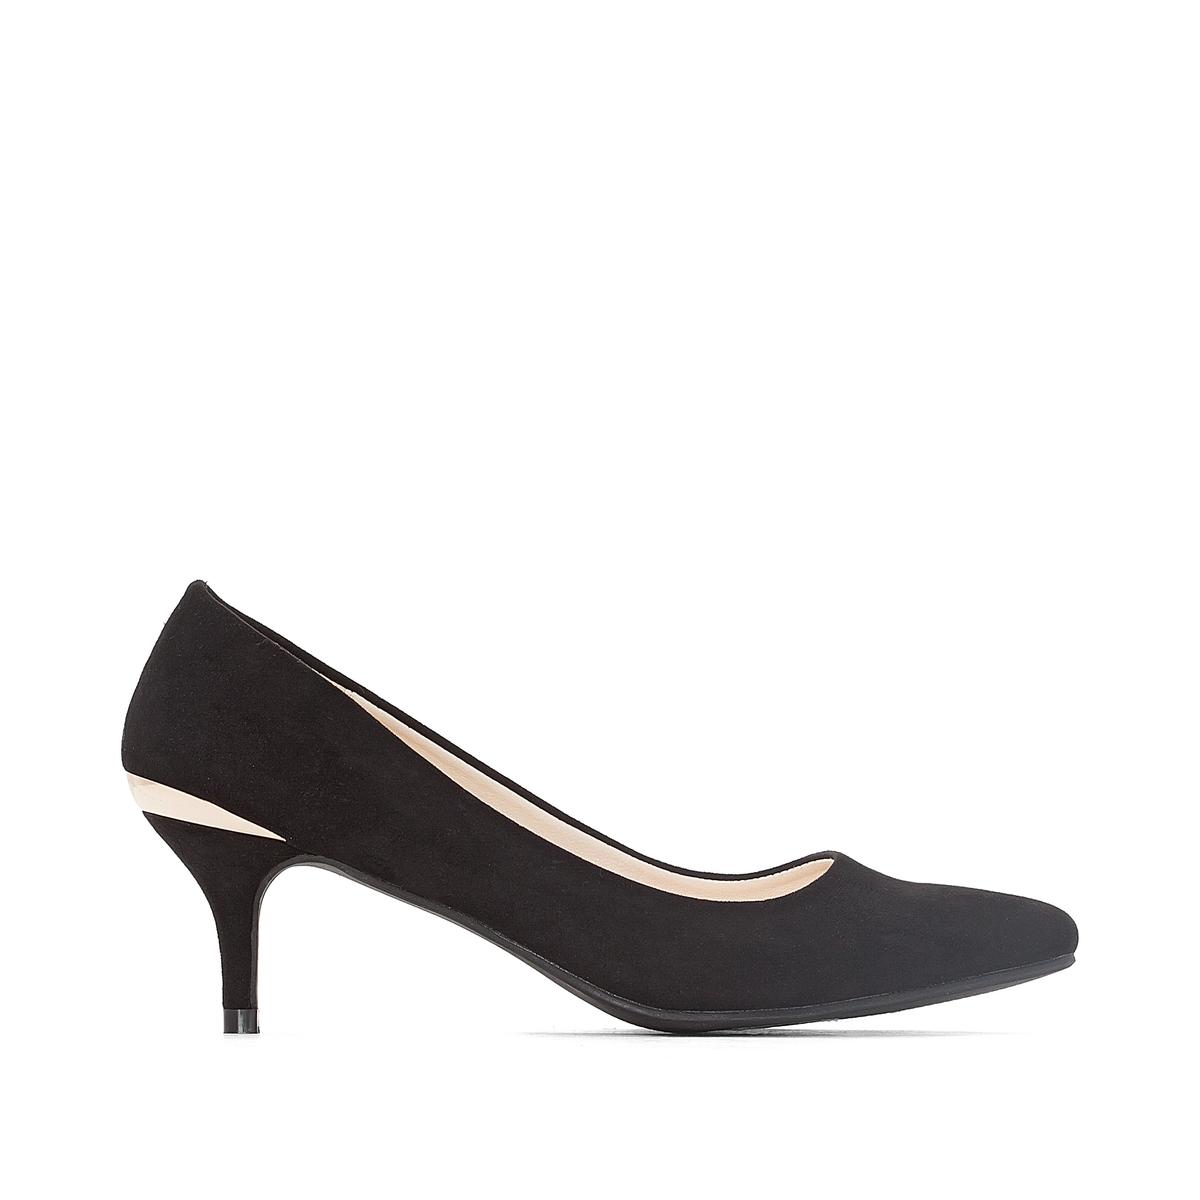 Туфли на каблуке kitten heel women high heel shoes platform pumps woman thin high heels party wedding shoes ladies kitten heels plus size 34 40 41 42 43